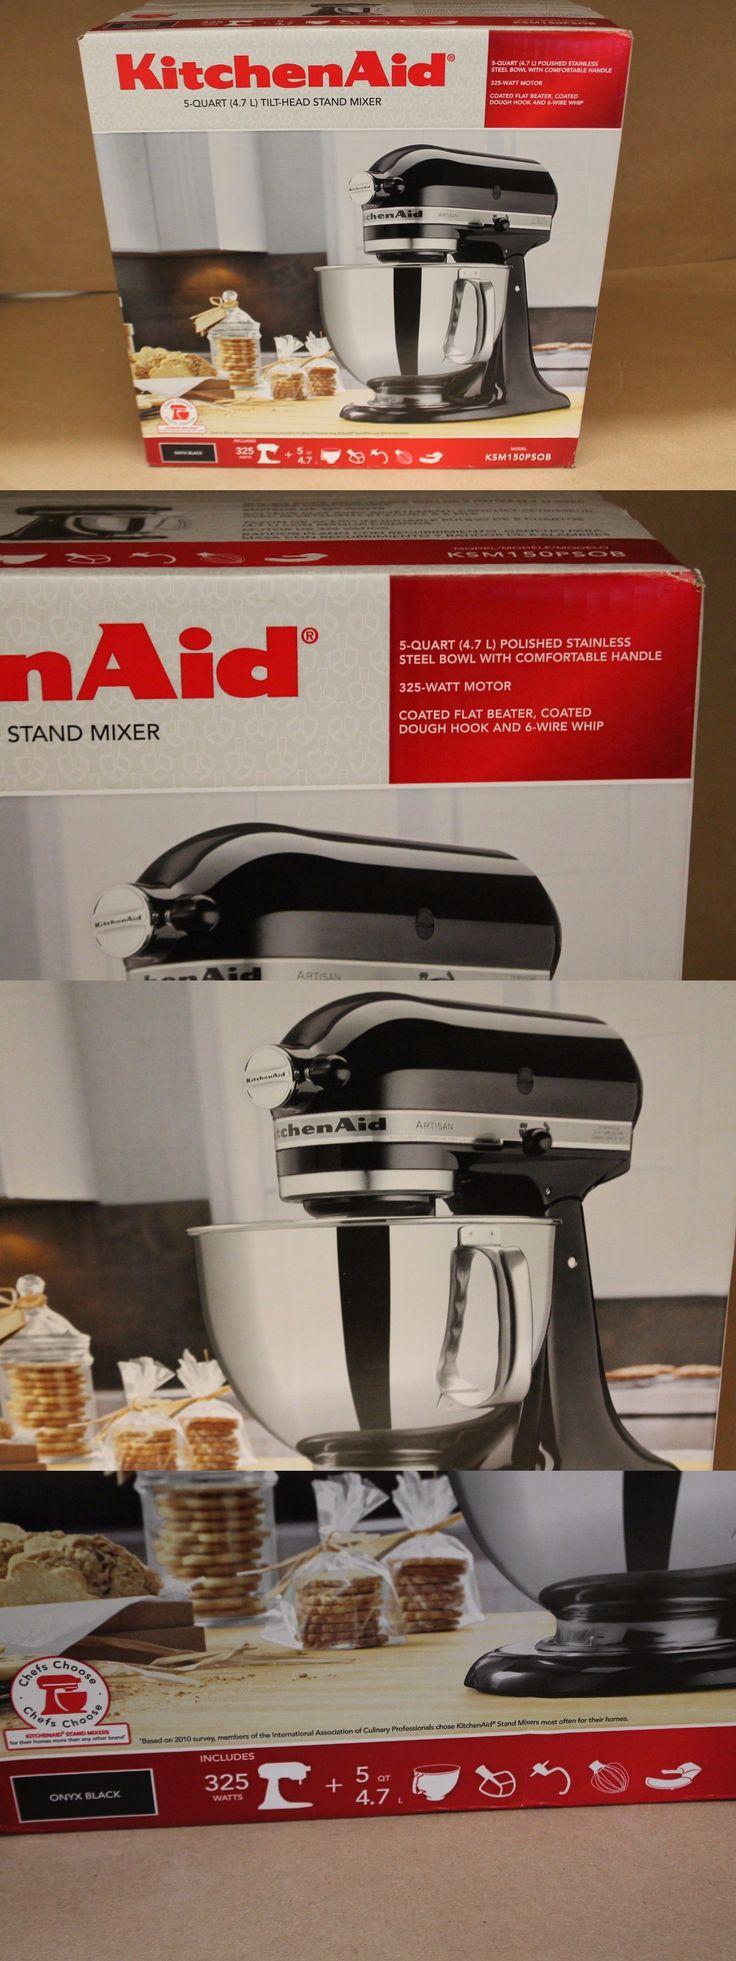 Mixers Countertop 133701: Kitchenaid 5-Quart Artisan Stand Mixer Black Ksm150psob -> BUY IT NOW ONLY: $175 on eBay!